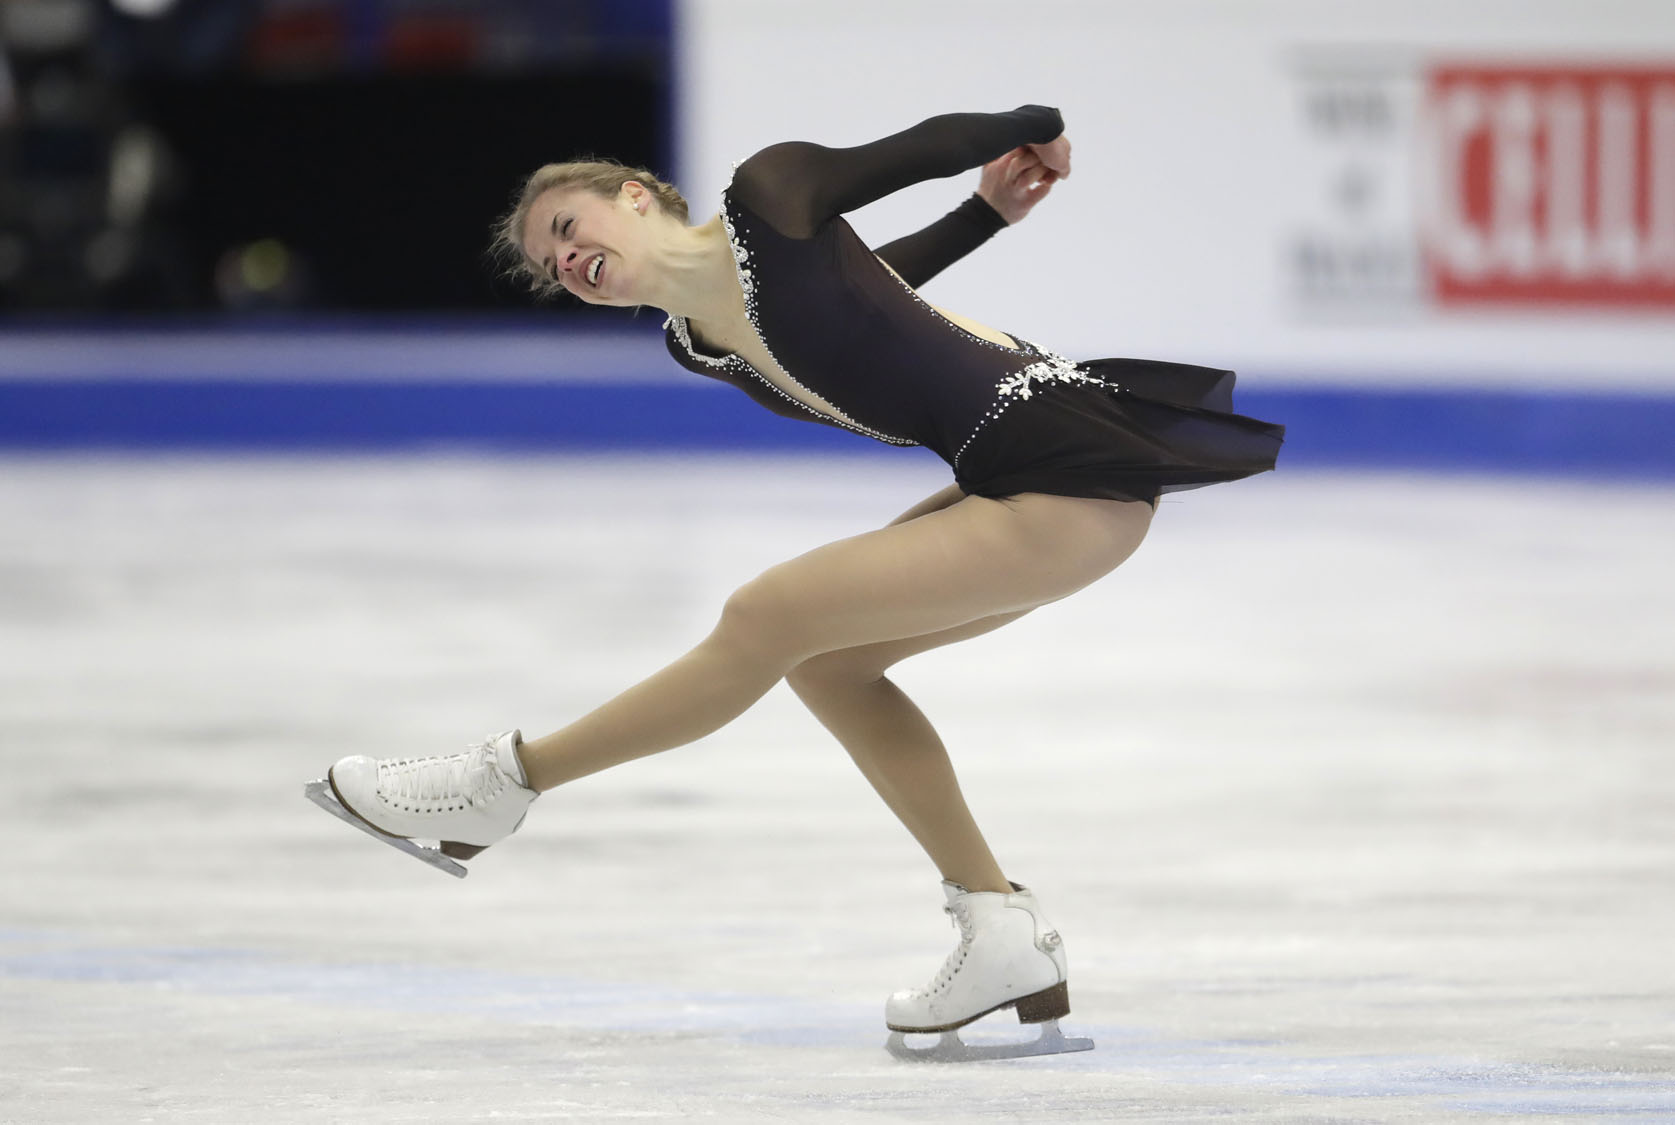 2017 European Figure Skating Championships